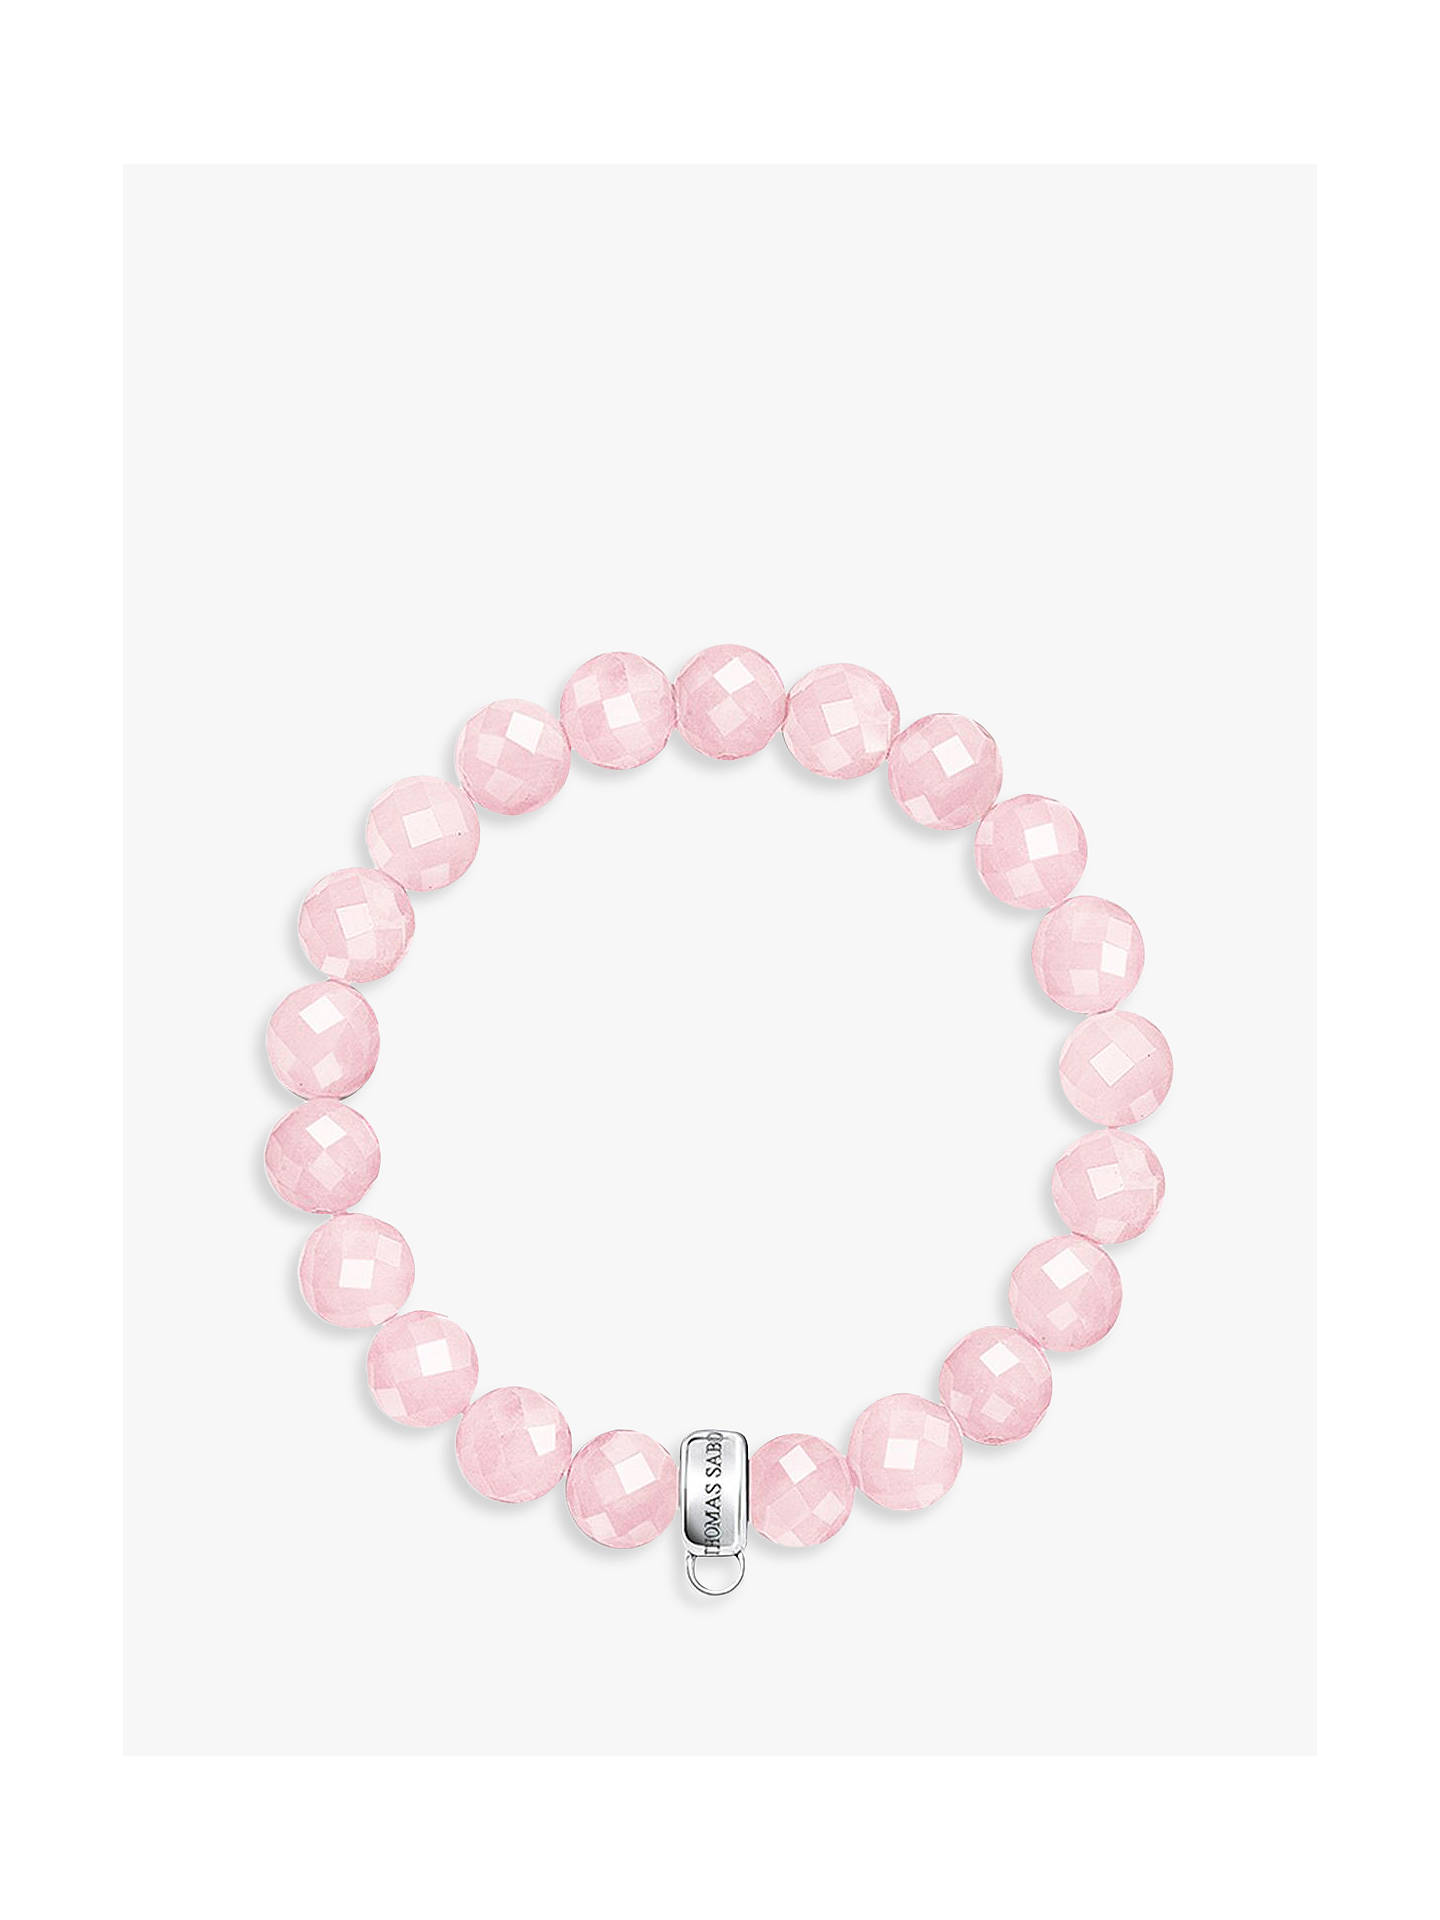 best service dd767 7fd25 ... running shoes eye catching 8c6bd 7c128  sweden buythomas sabo charm  club rose quartz bracelet pink online at johnlewis 65ad7 86014